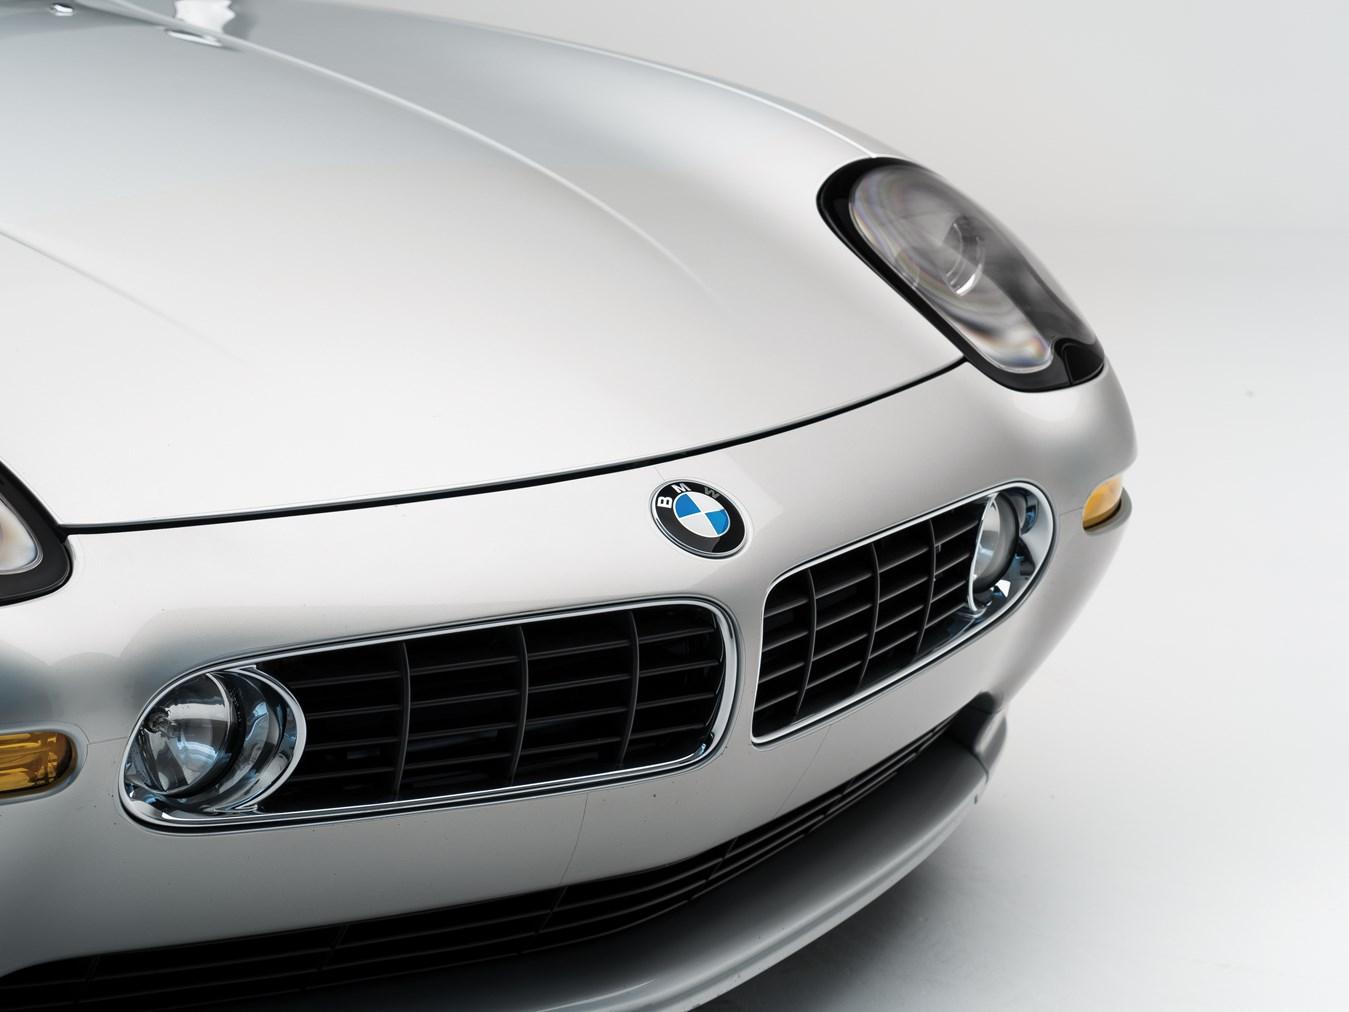 2000 BMW Z8 front detail